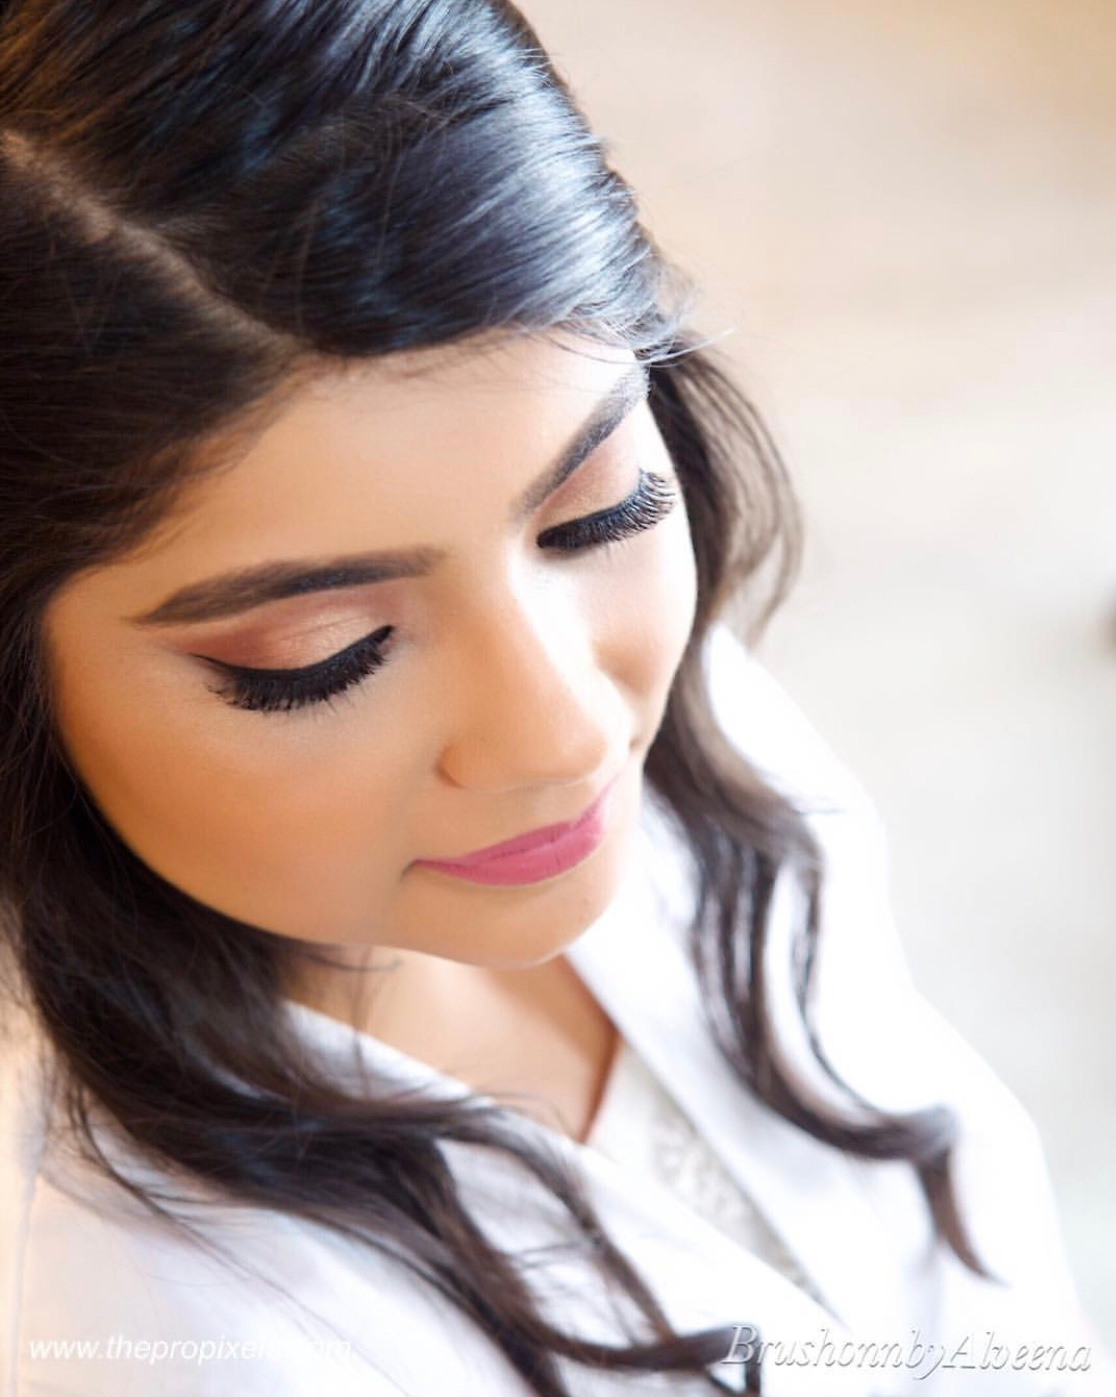 BrushOnn by Alveena Indian Wedding Makeup Artist Dallas